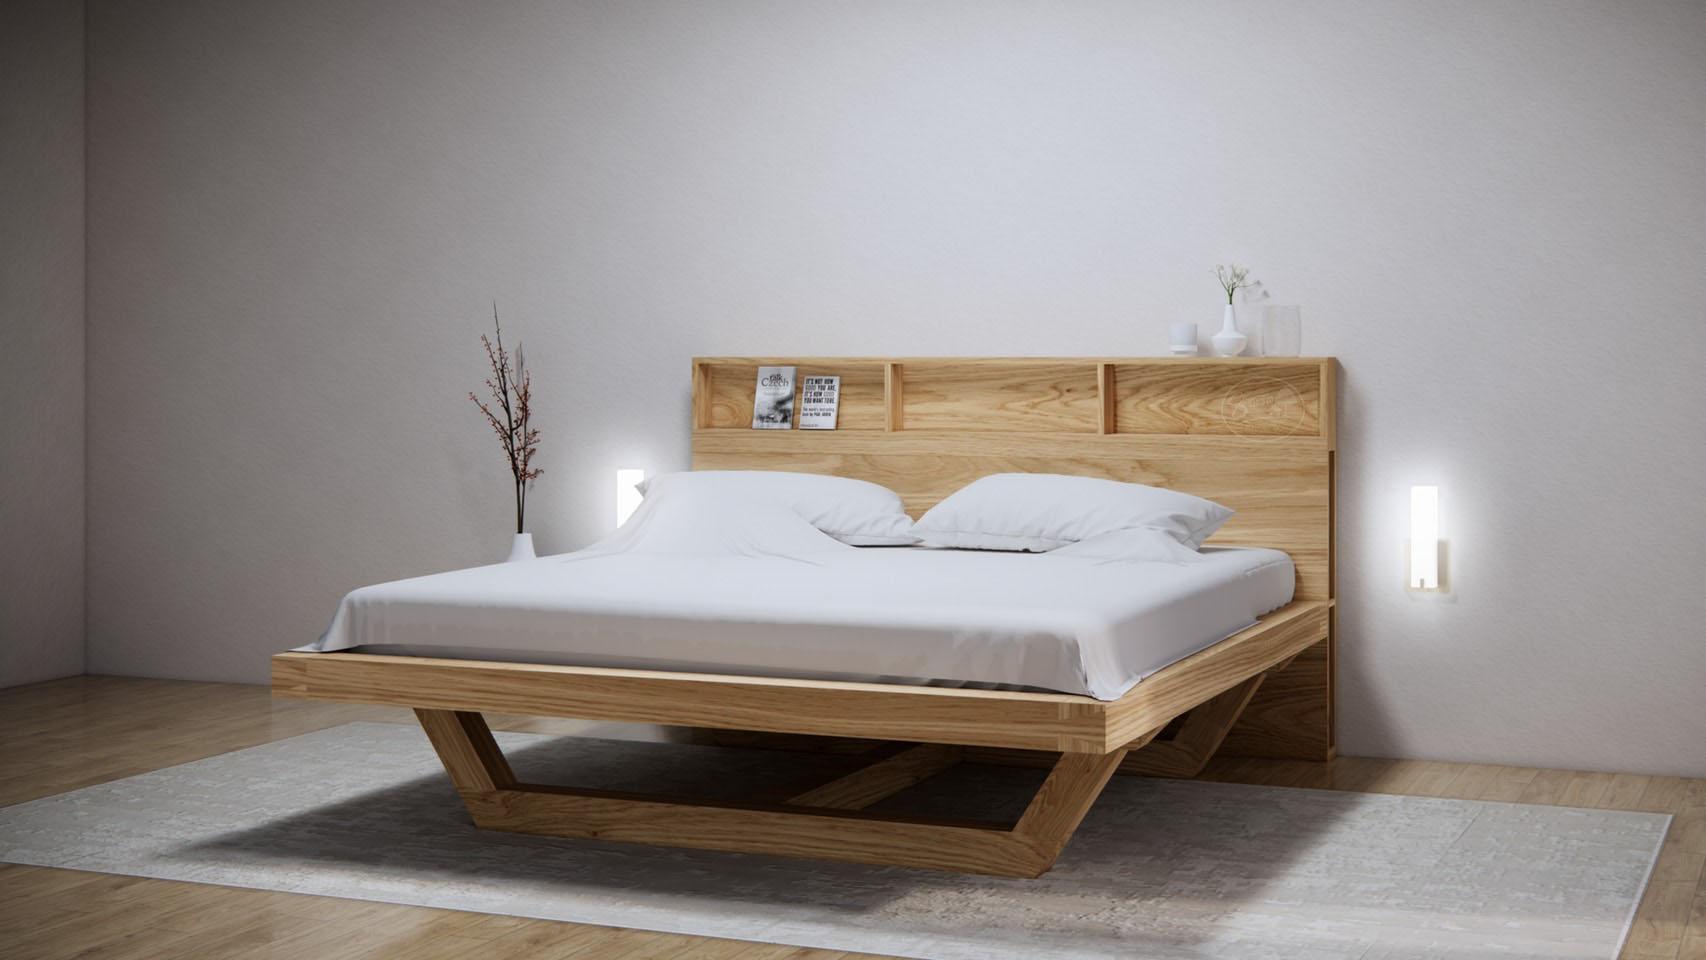 KR122 U Bed -เตียงนอนขา U มีช่องใส่ของ